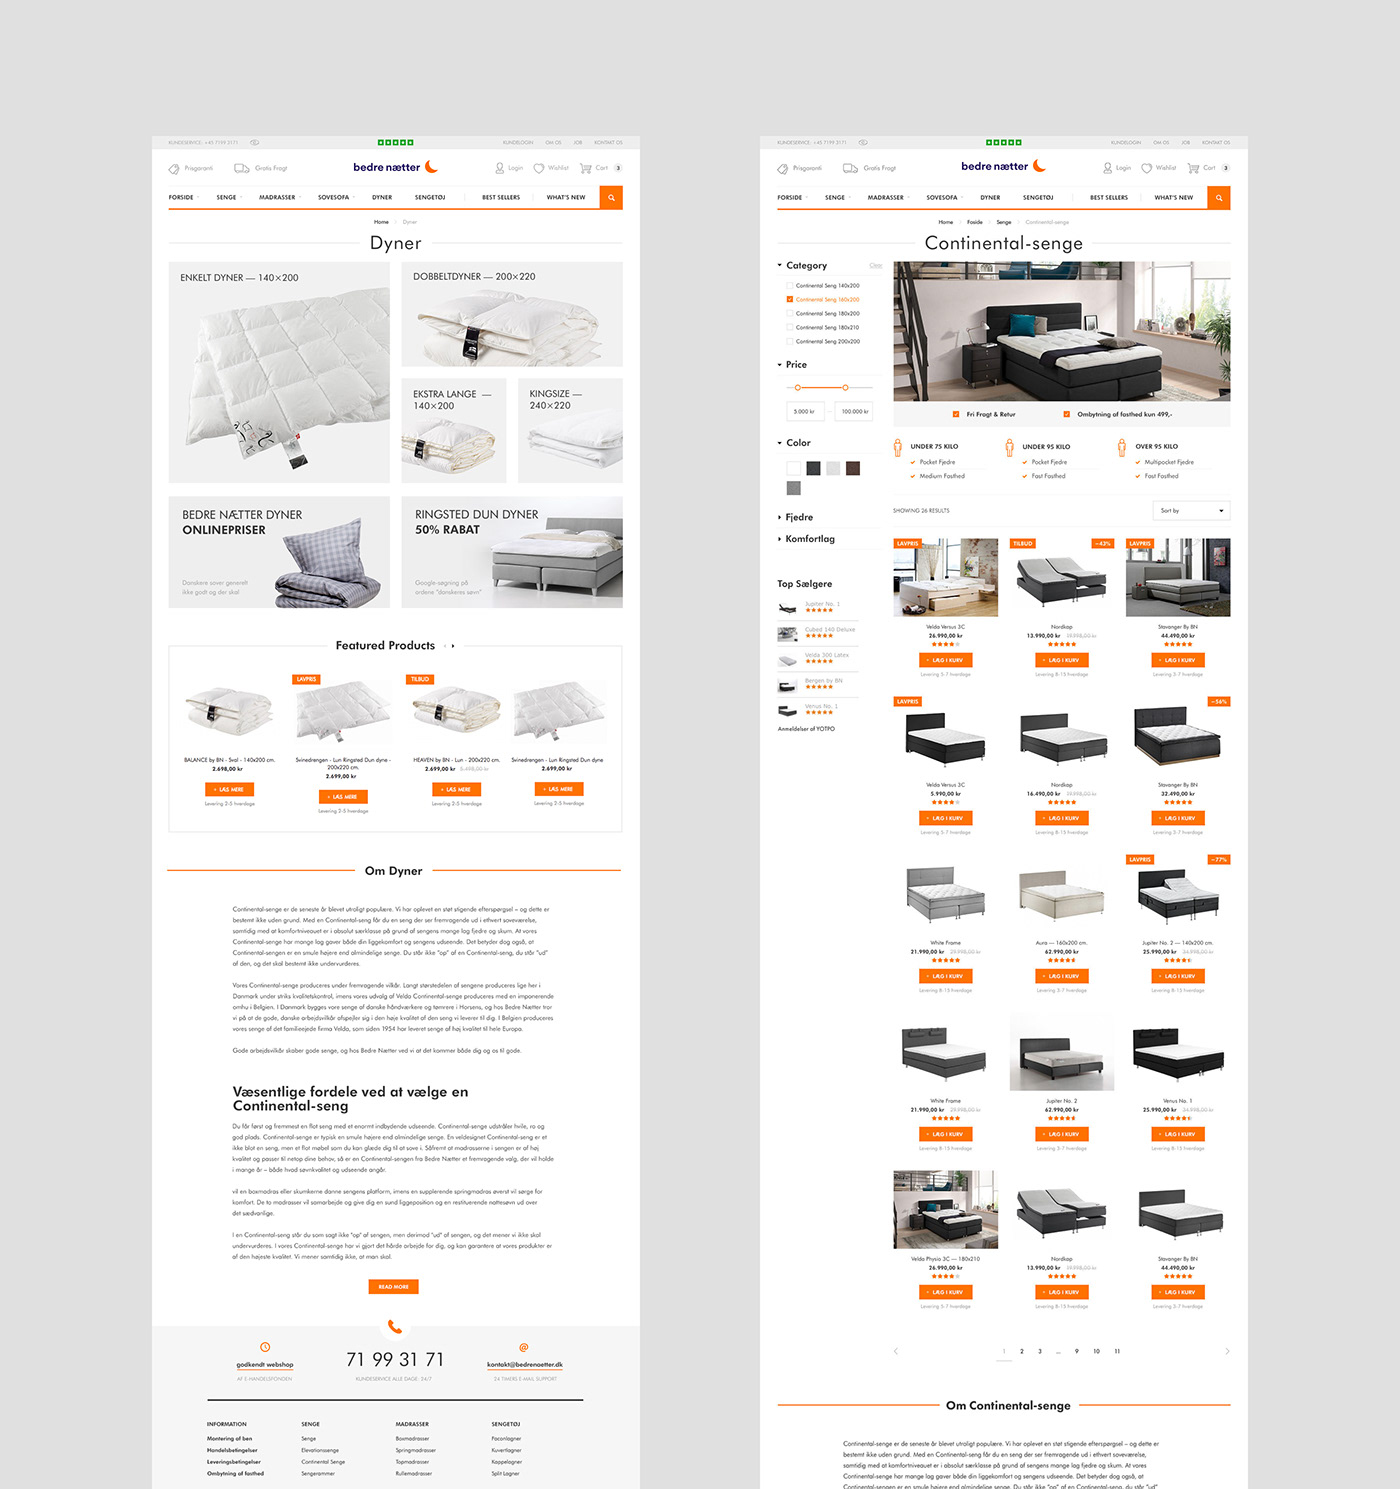 denmark Ecommerce furniture Interior magento2 Website shop store ui design UX design